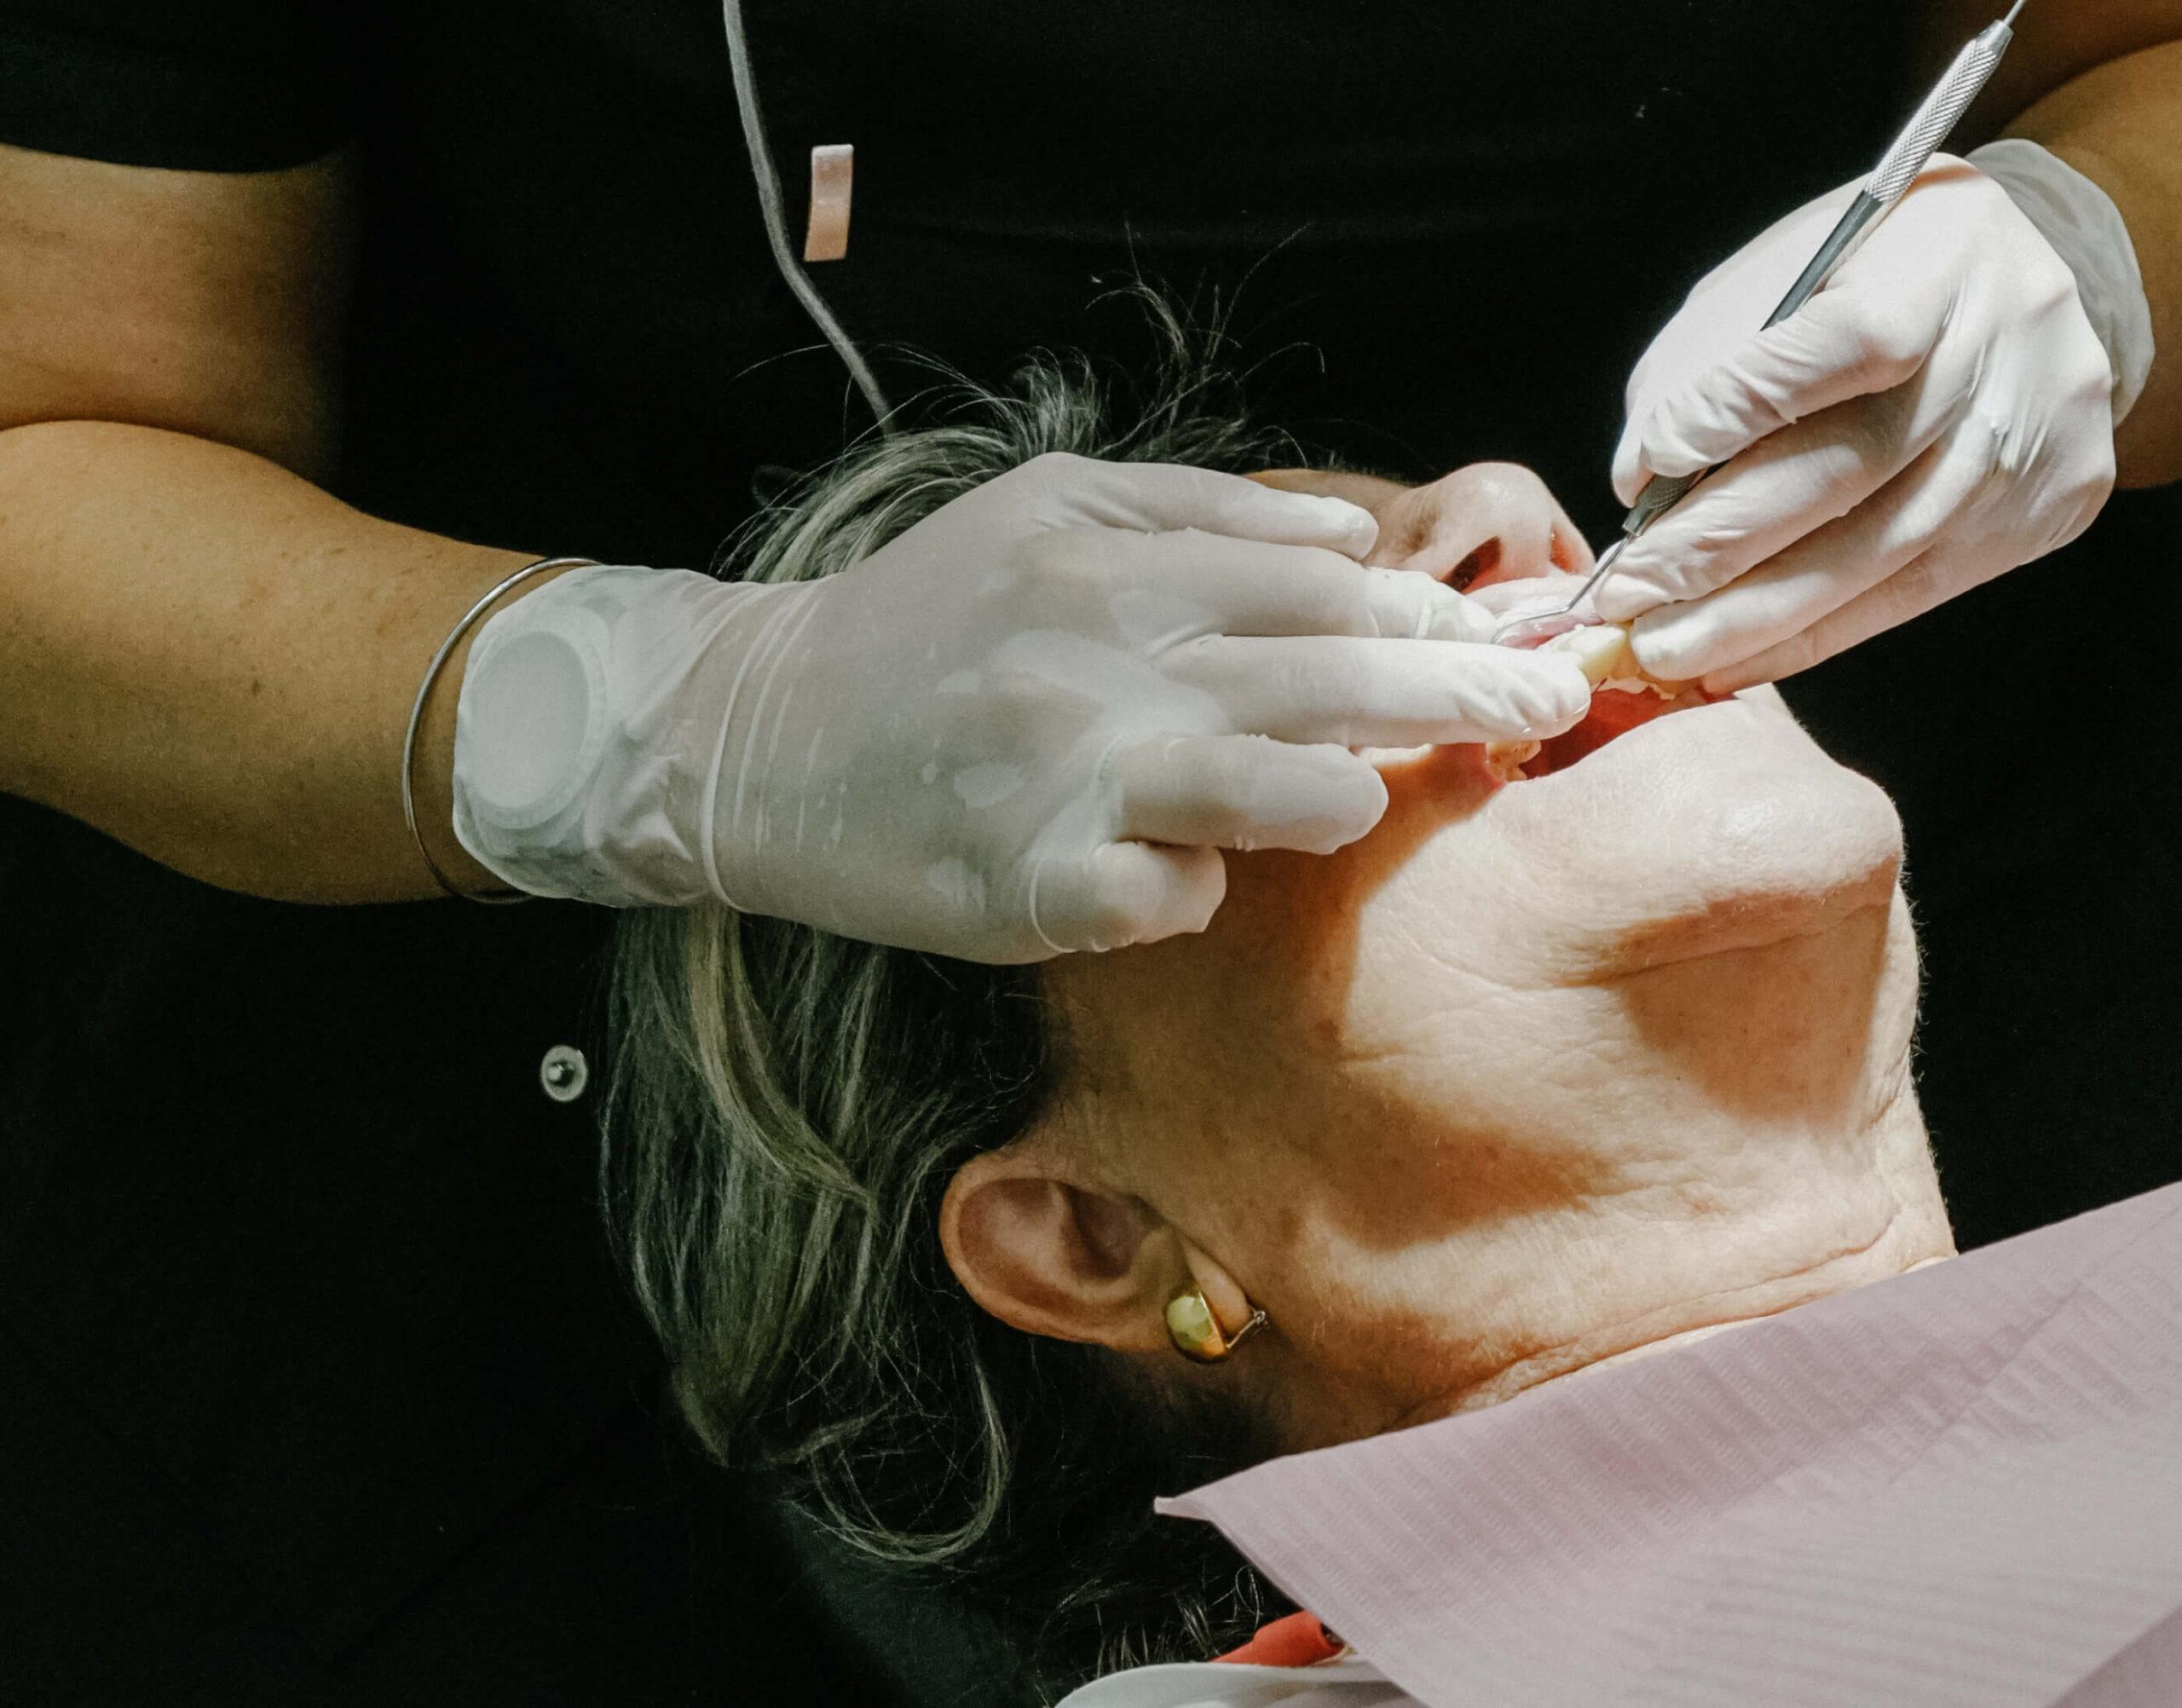 tratamiento dental pieza scaled